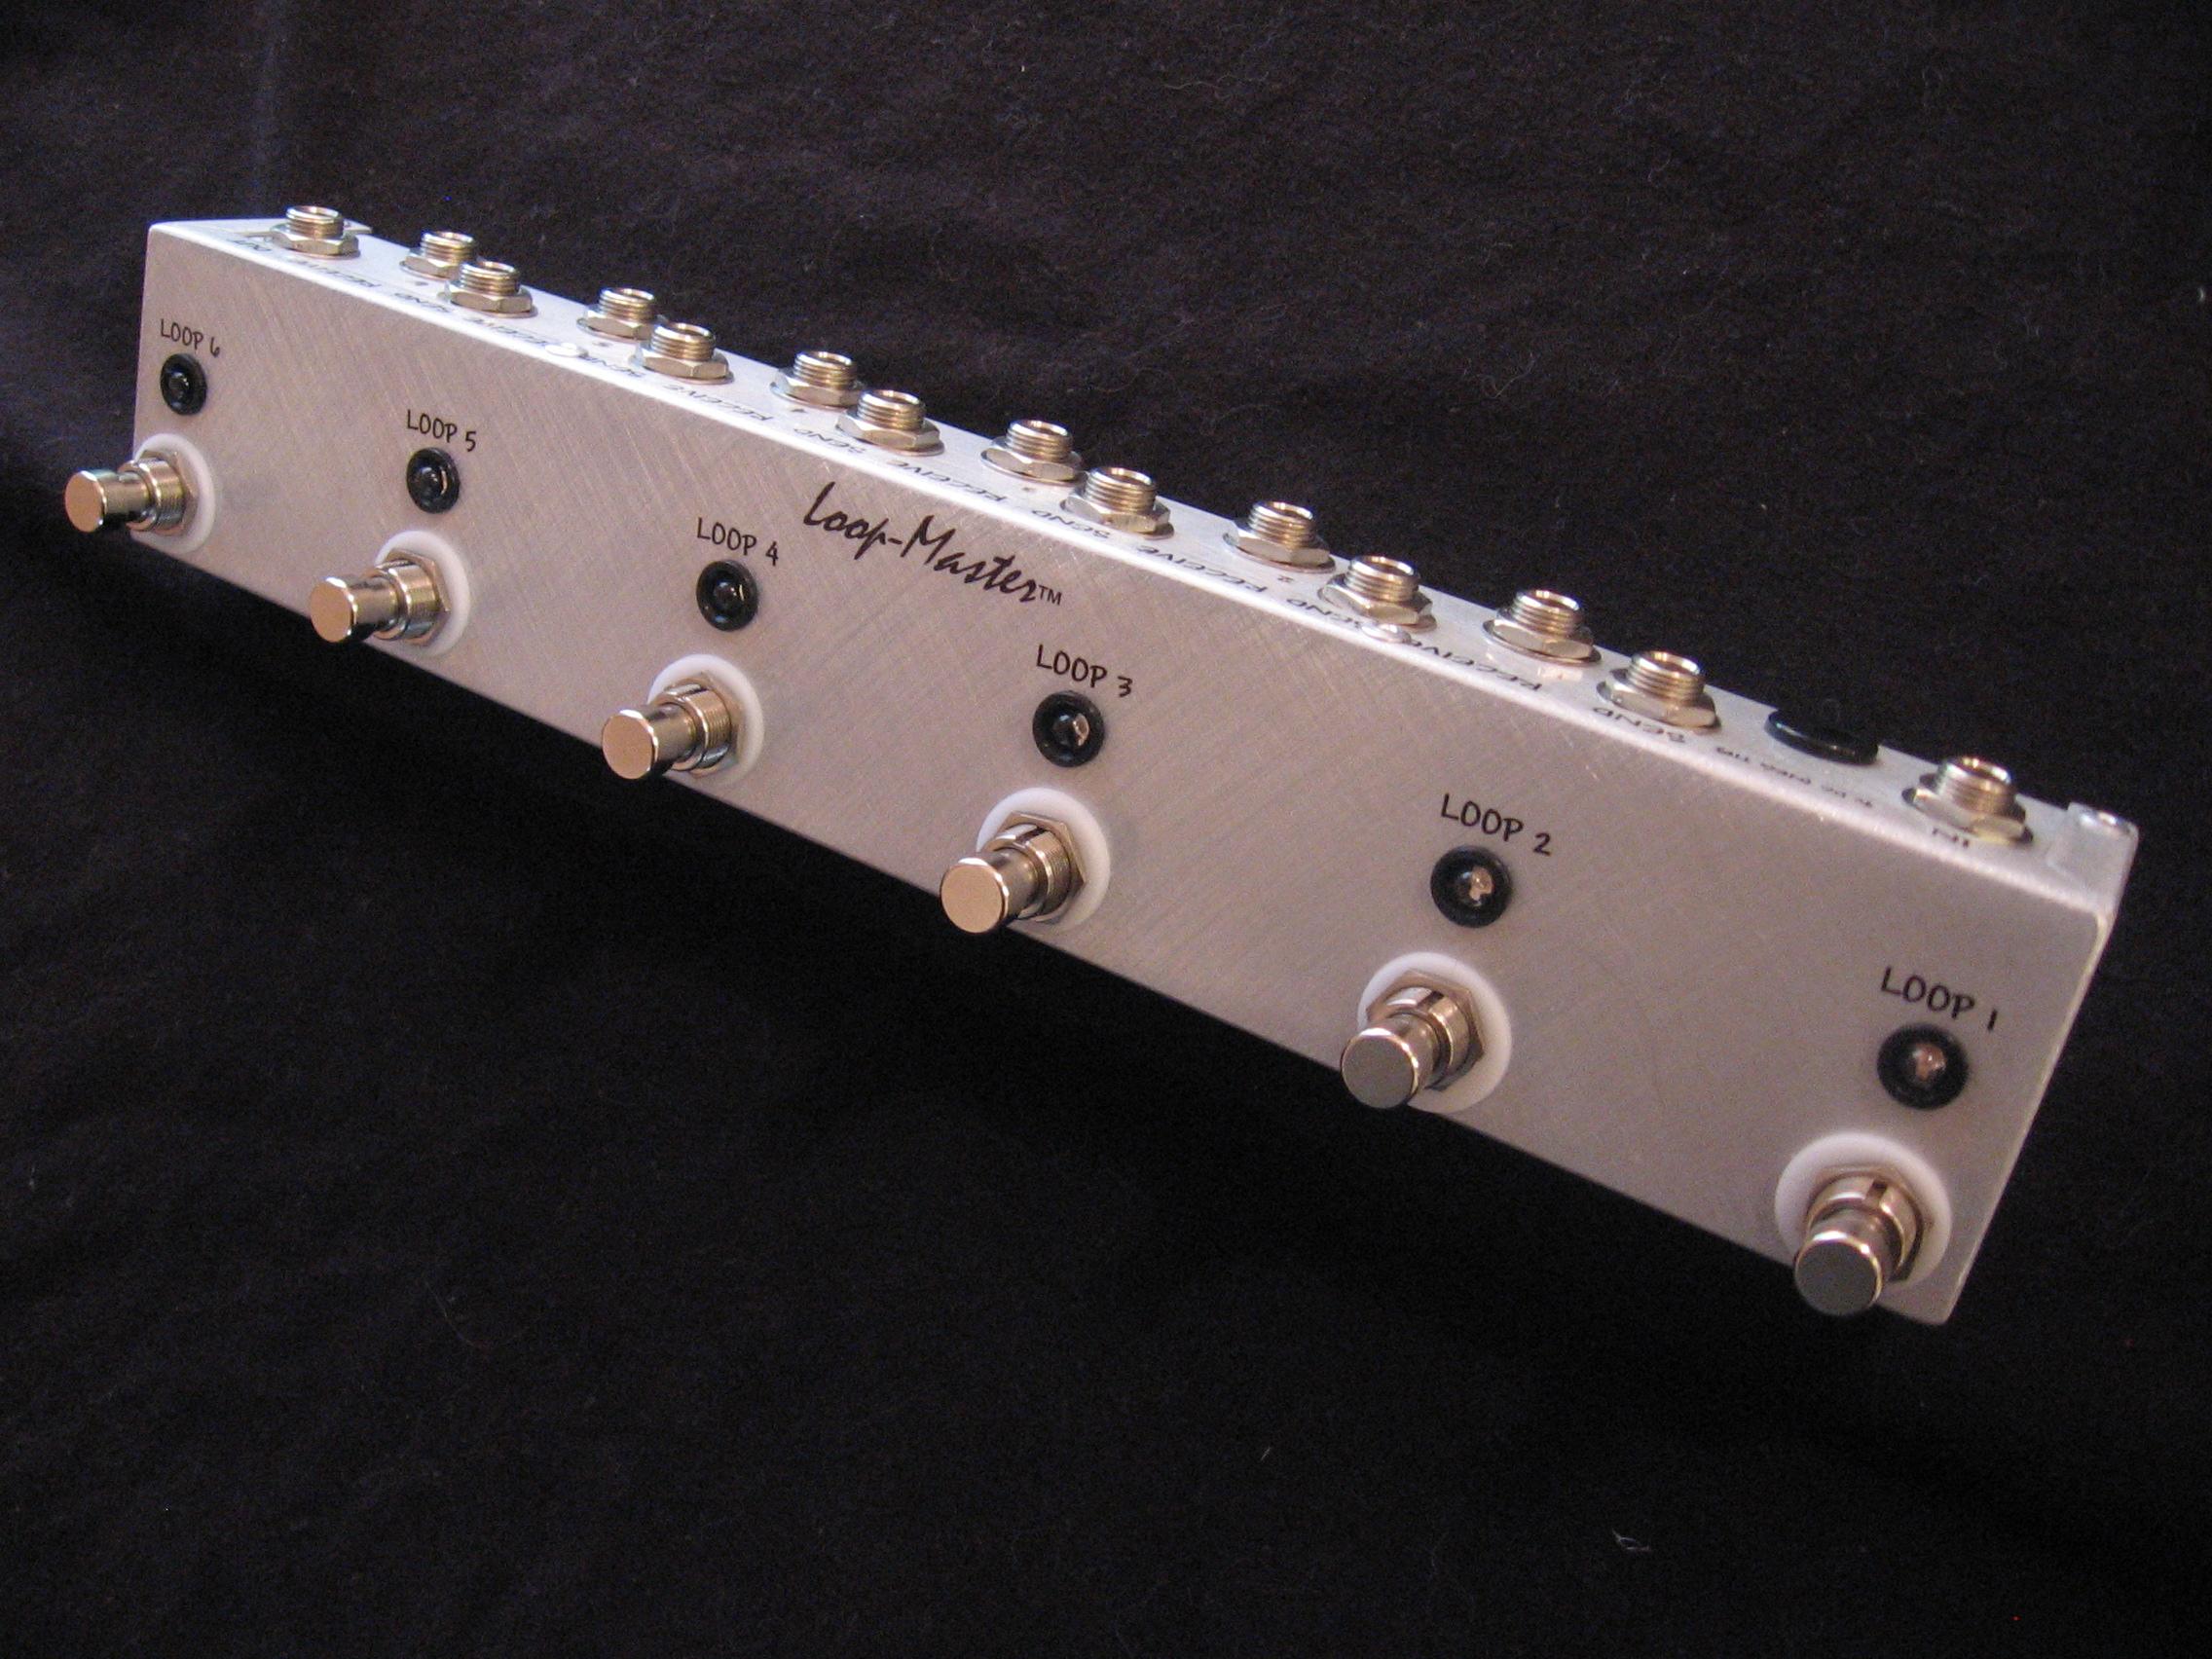 loop pedal switchers 6 looper loop master pedals. Black Bedroom Furniture Sets. Home Design Ideas